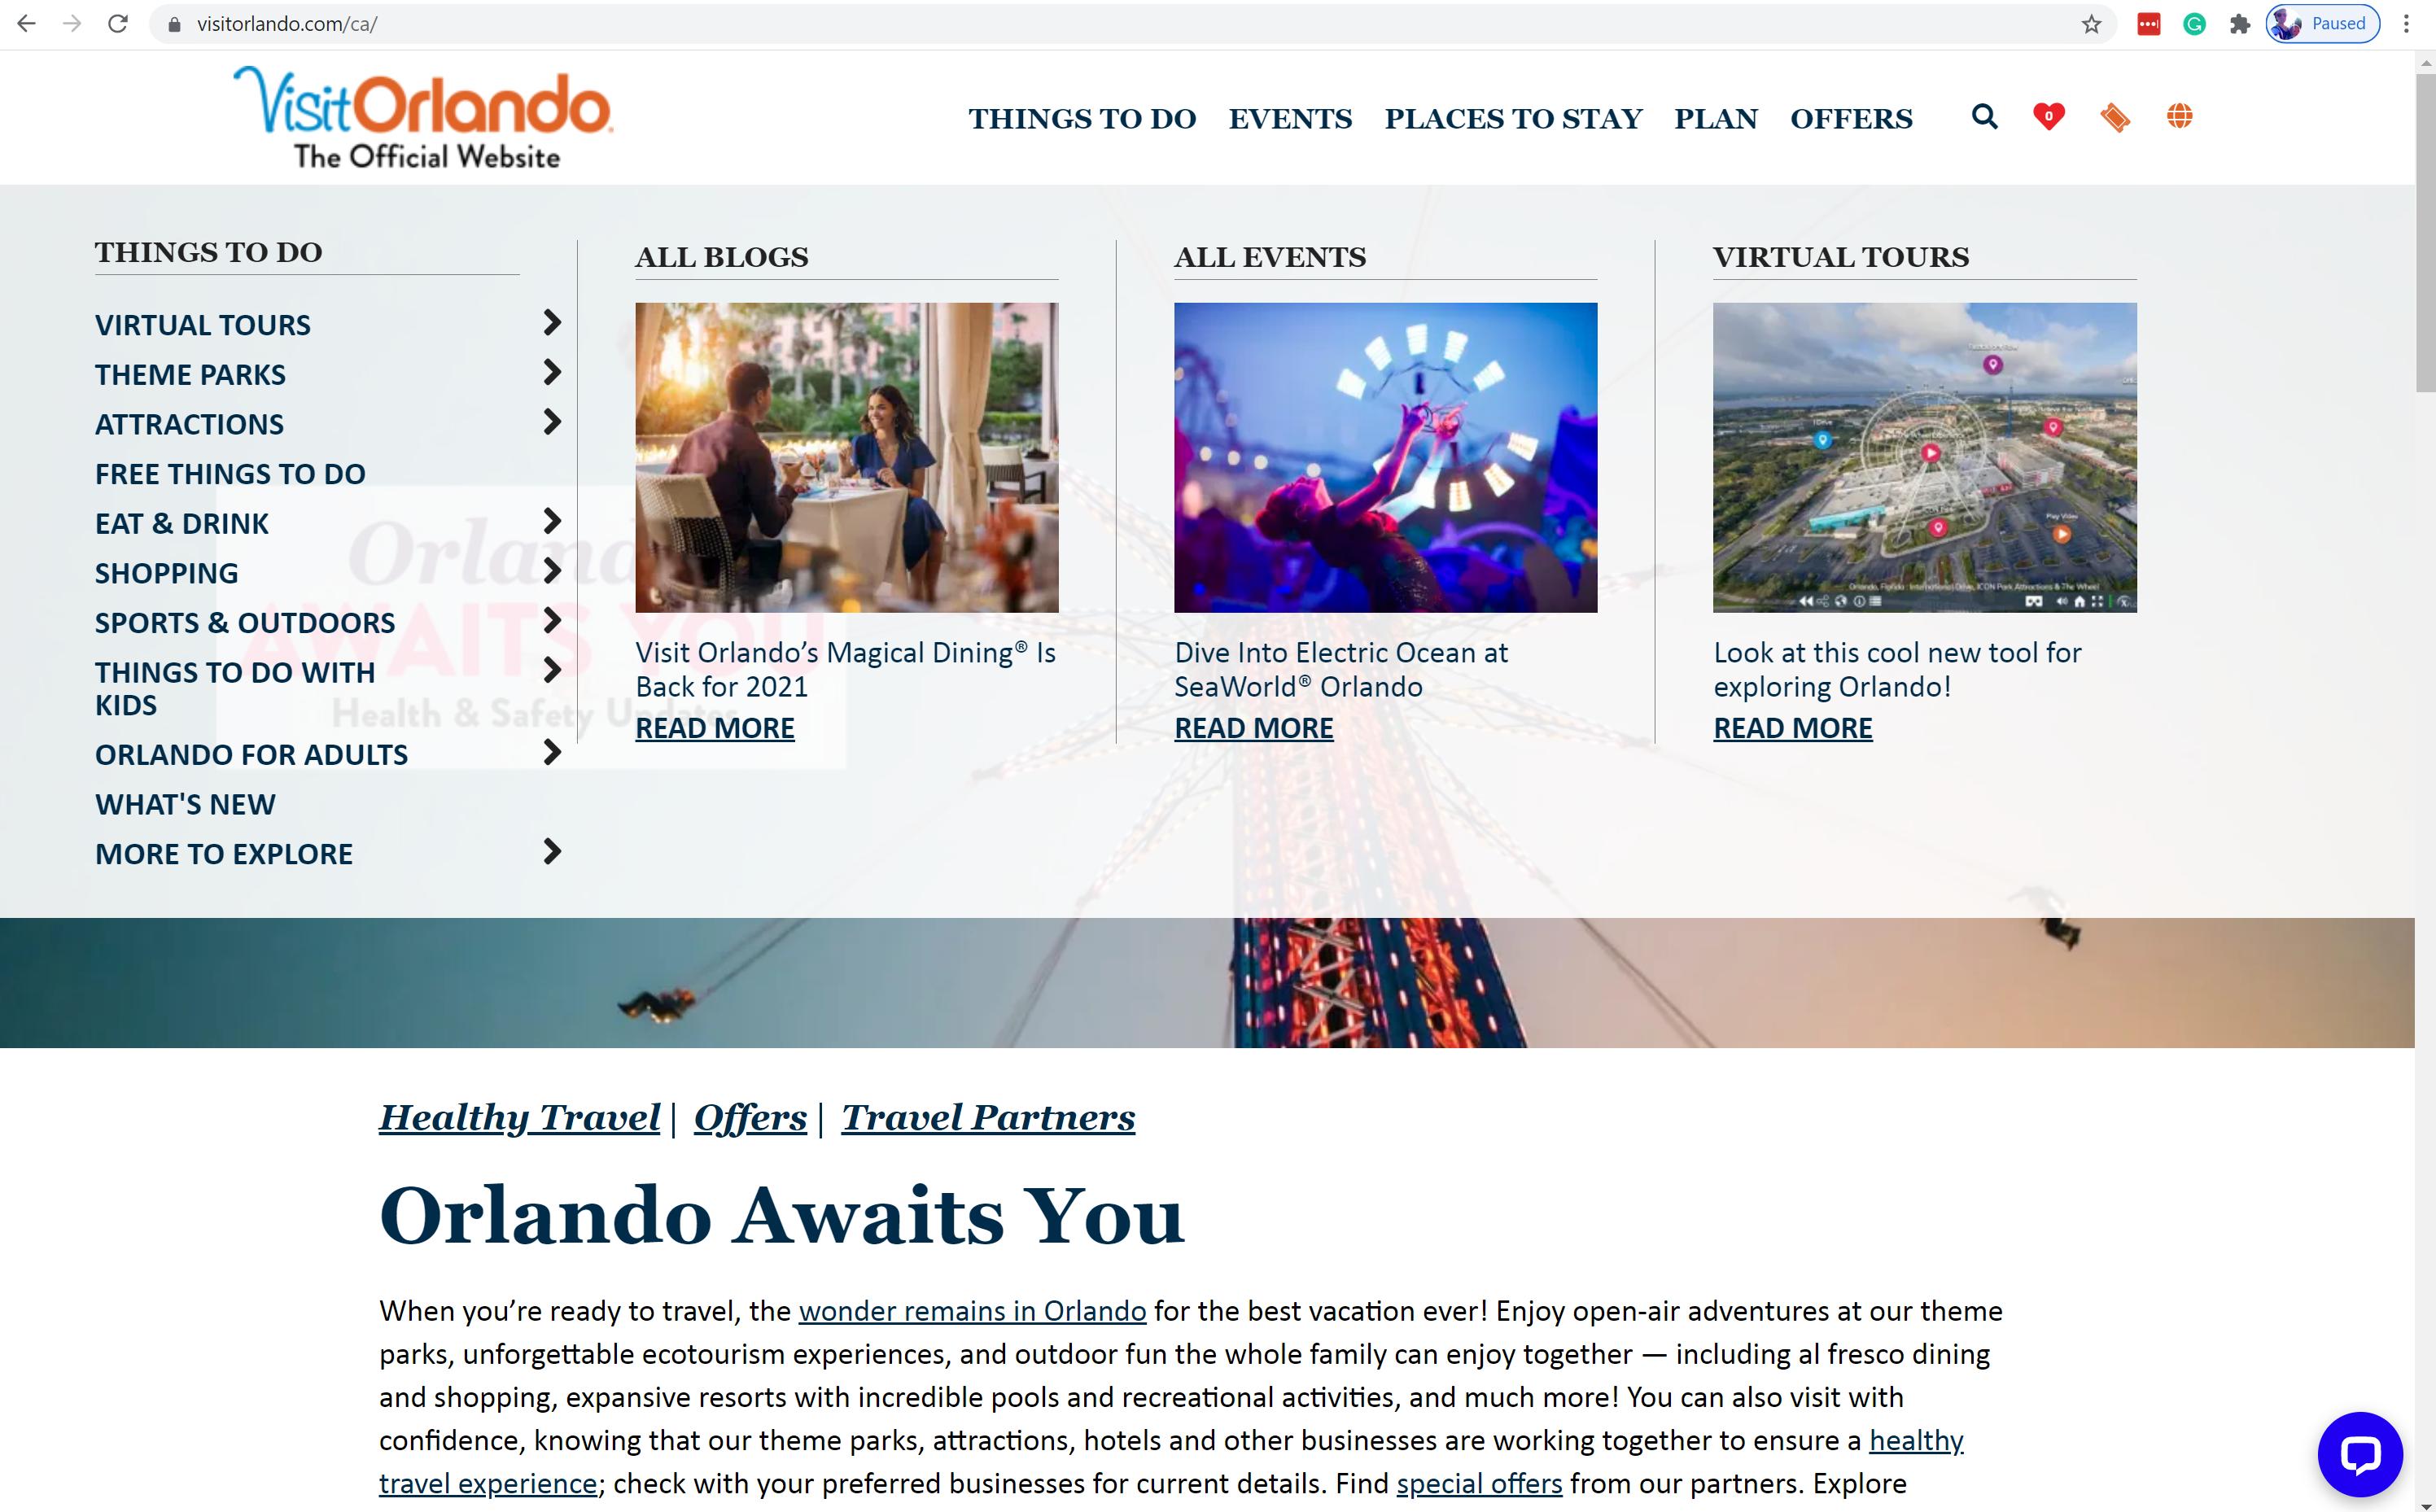 Visit Orlando: 20% increase in revenue with agile Headless Commerce